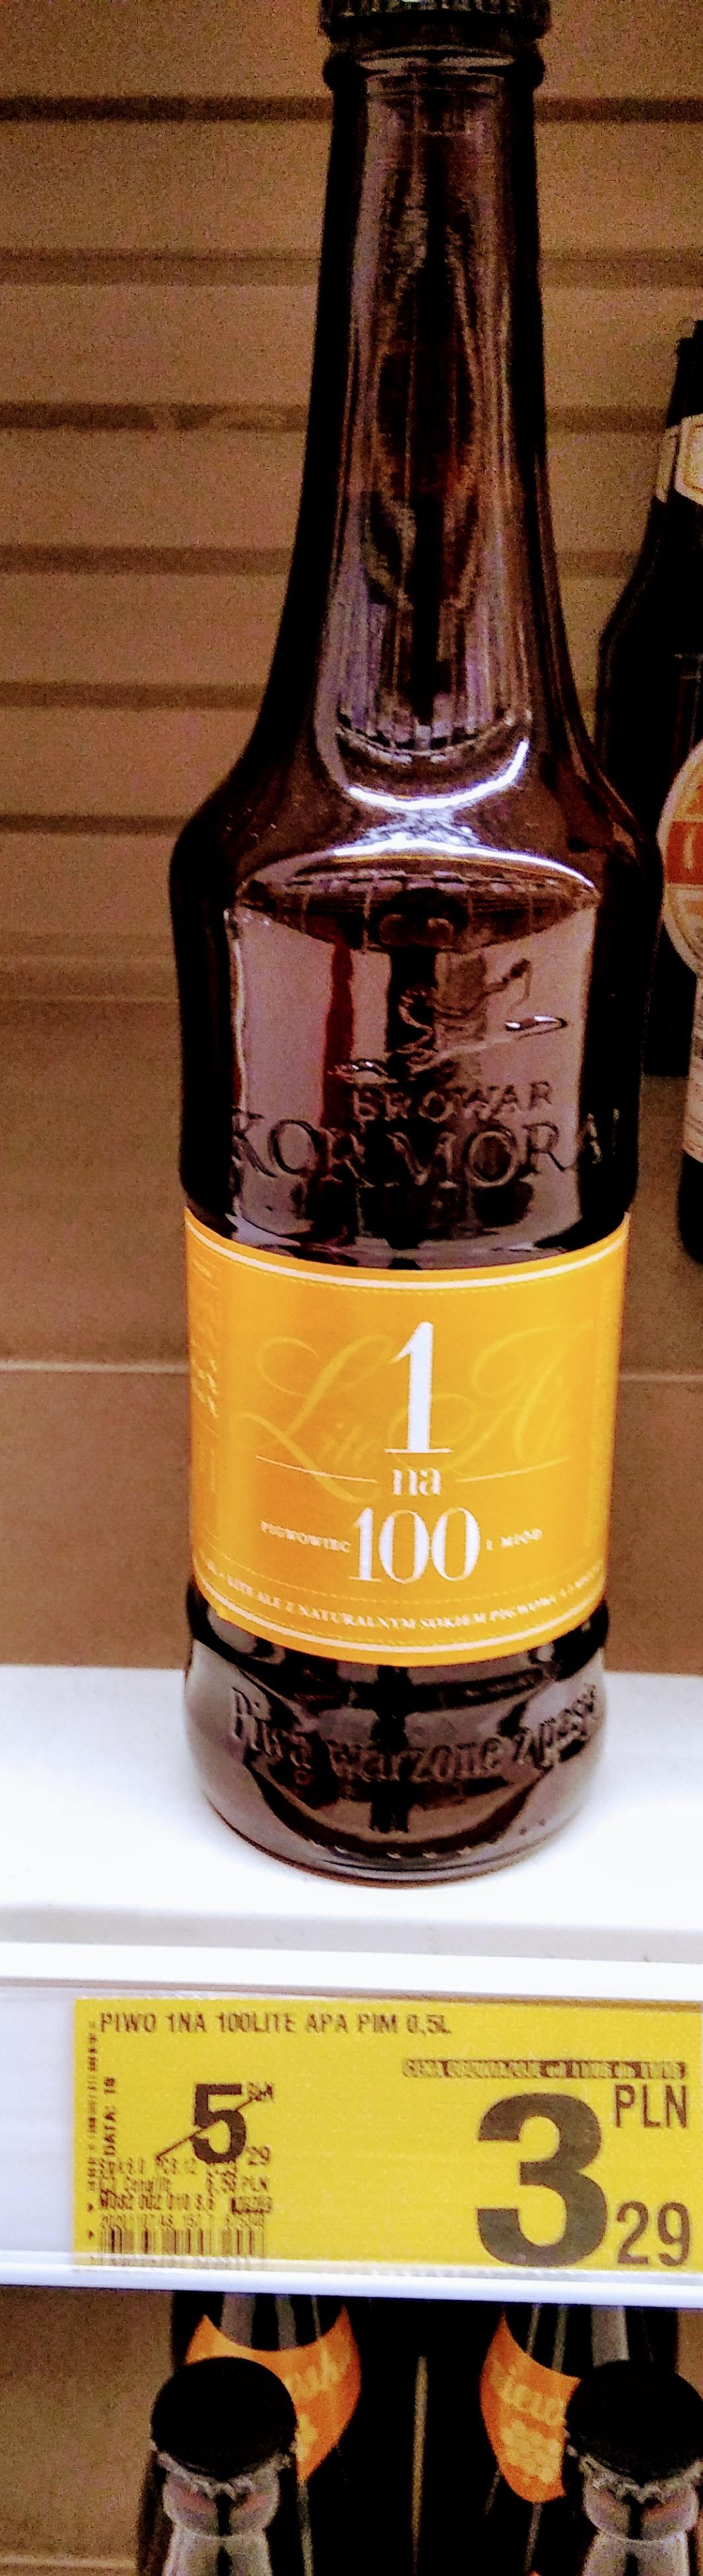 Piwo 1 na 100 Pigwowiec i miód browar Kormoran 1% alkoholu, butelka bezzwrotna,Auchan Gliwice